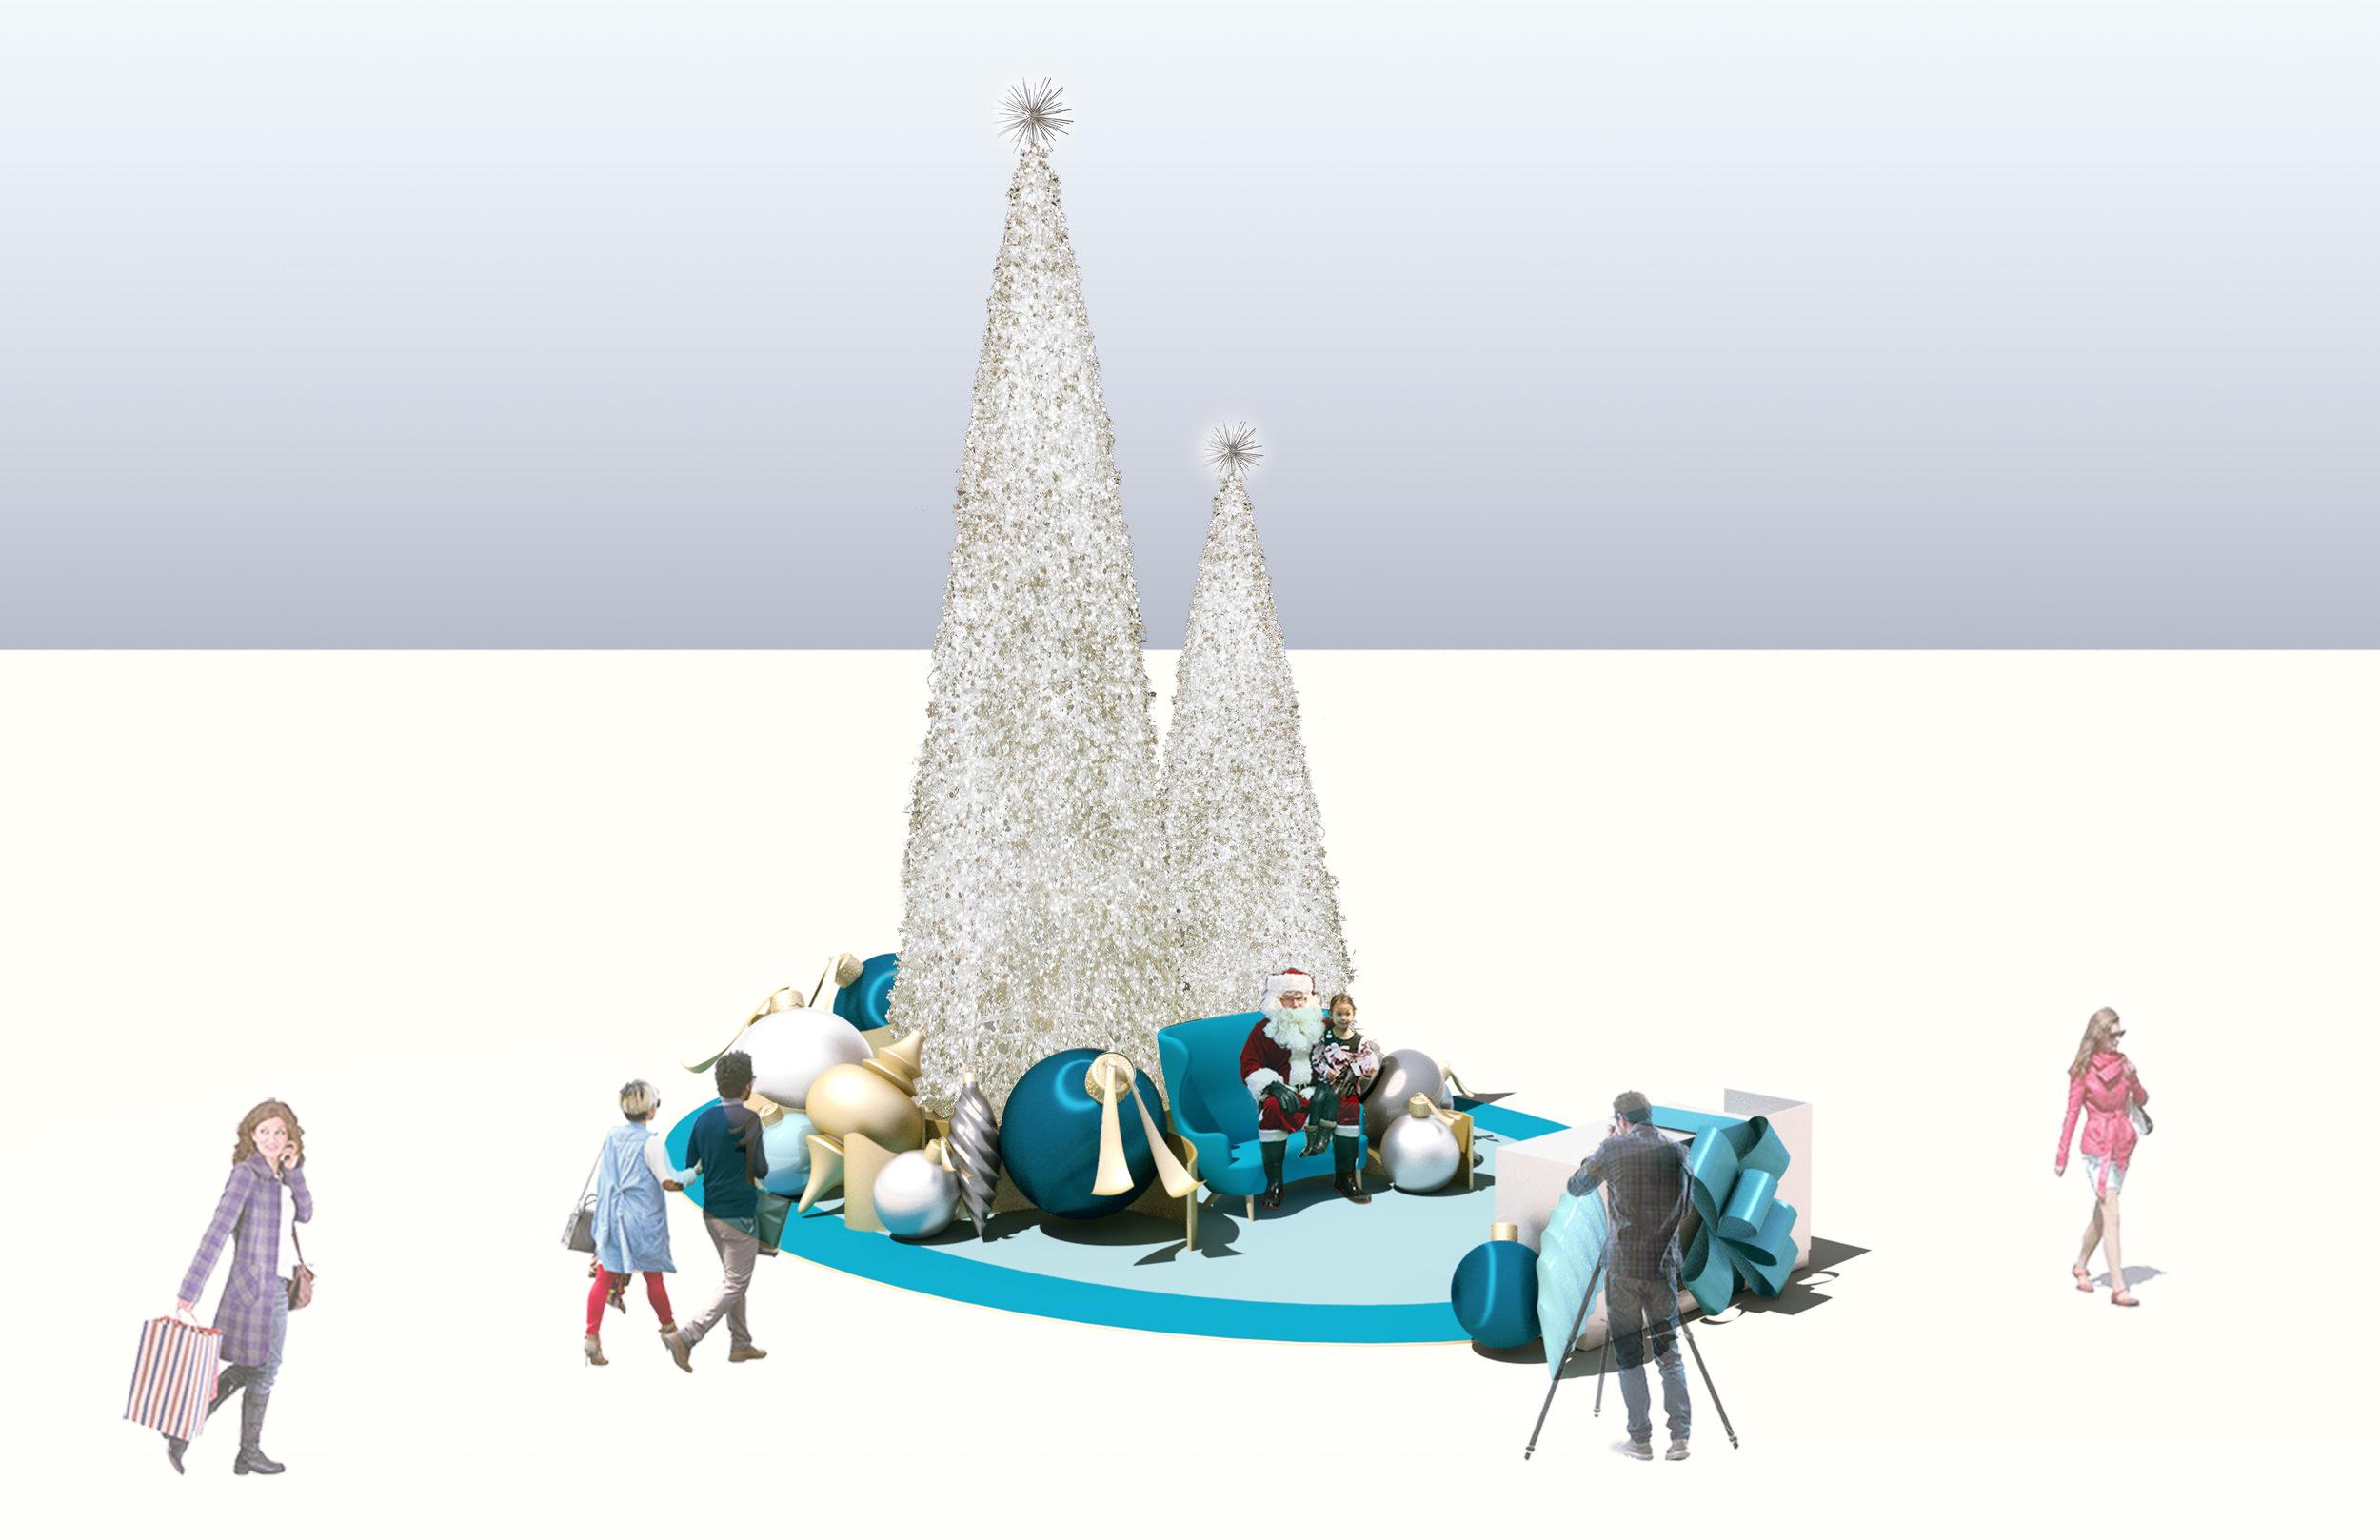 carlsbad holiday rendering 1.jpg